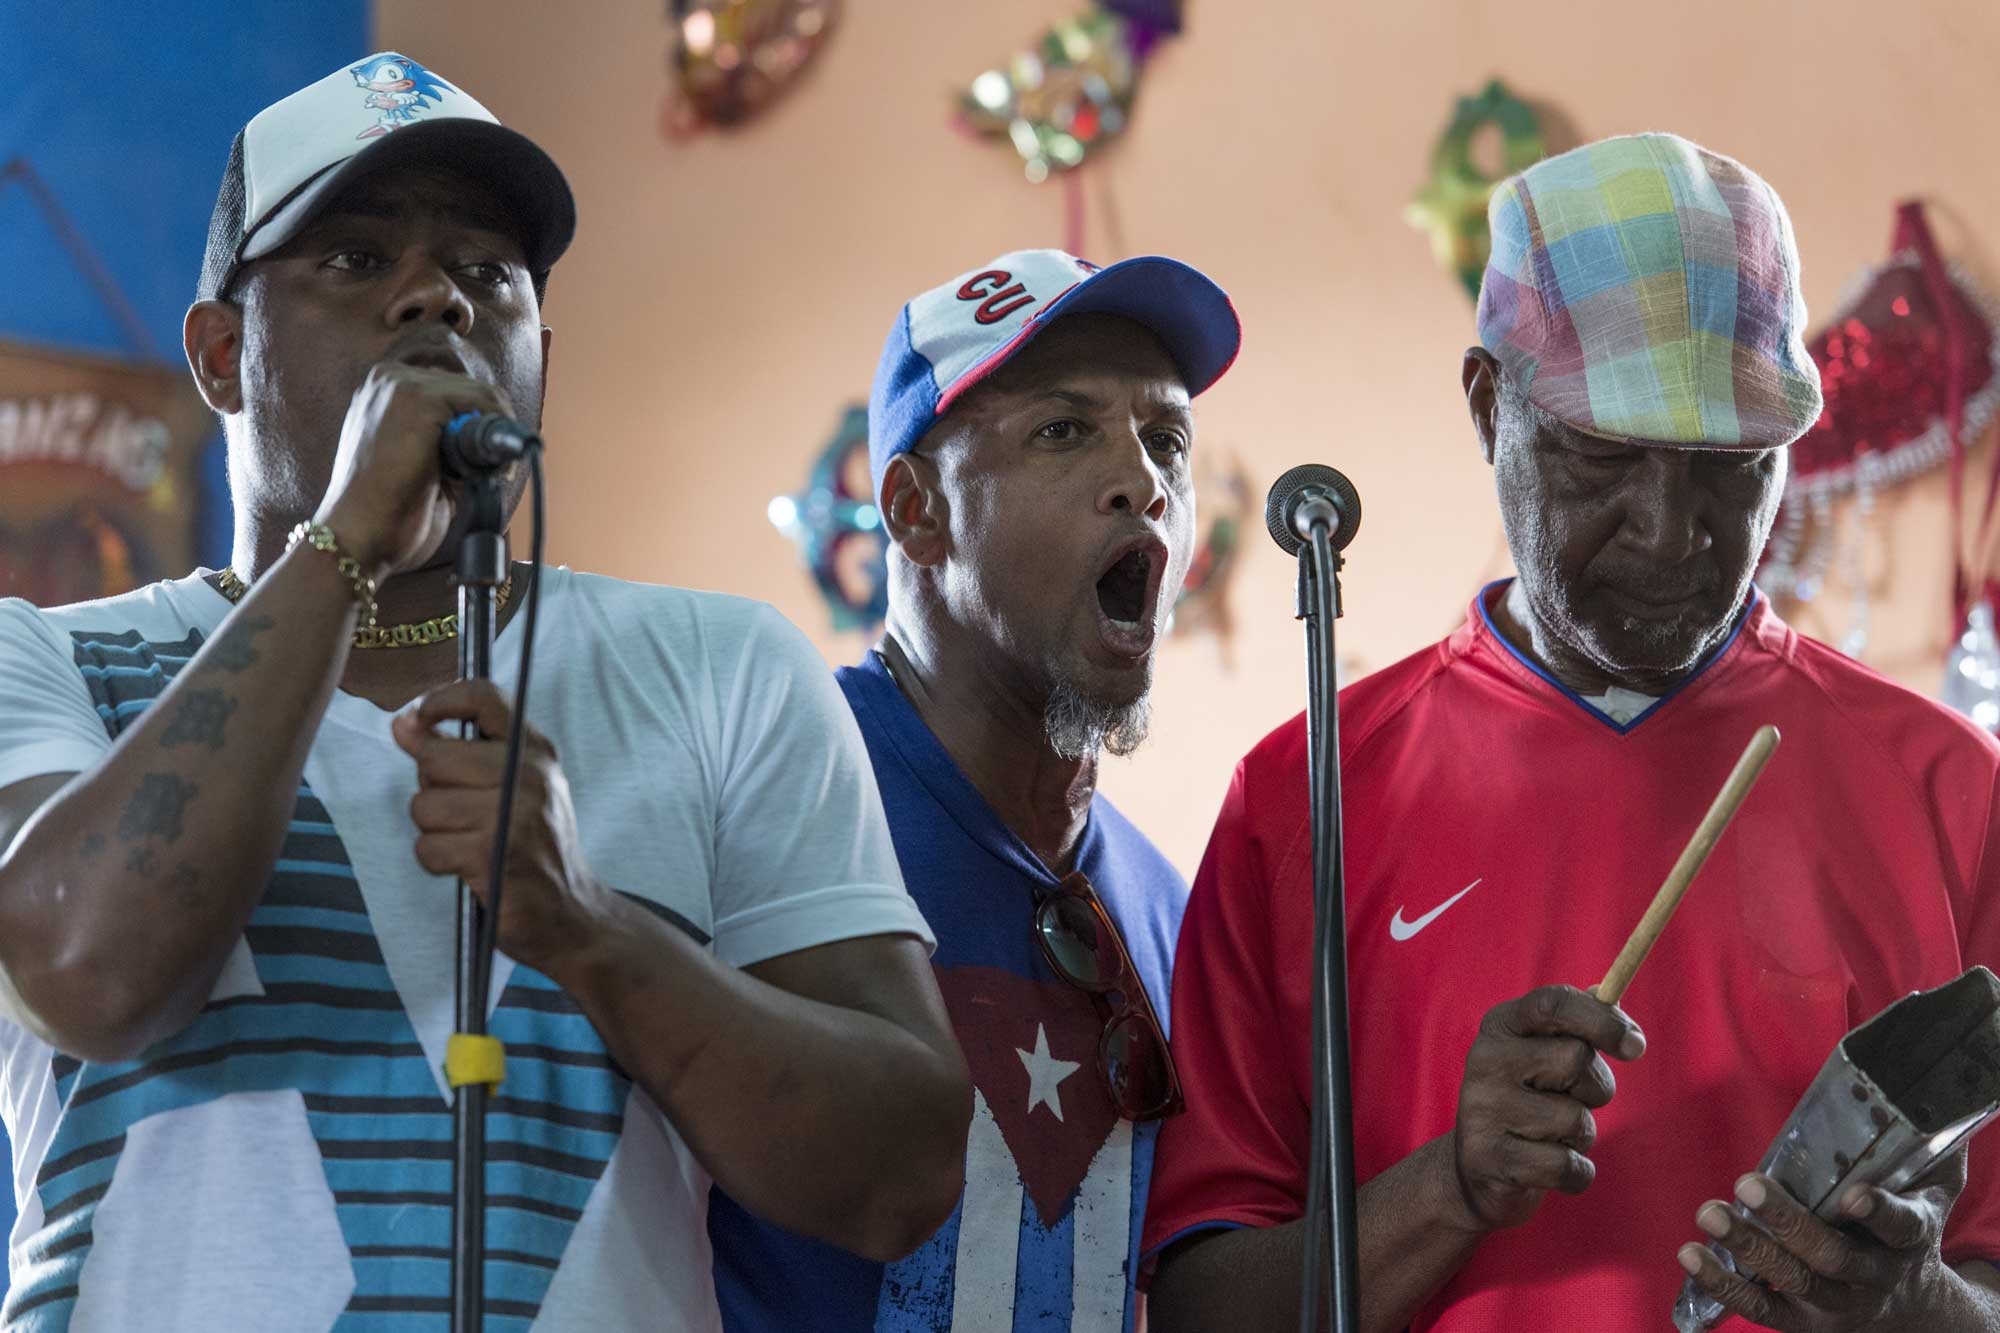 LosMuñequitosdeMatanzas performer trio